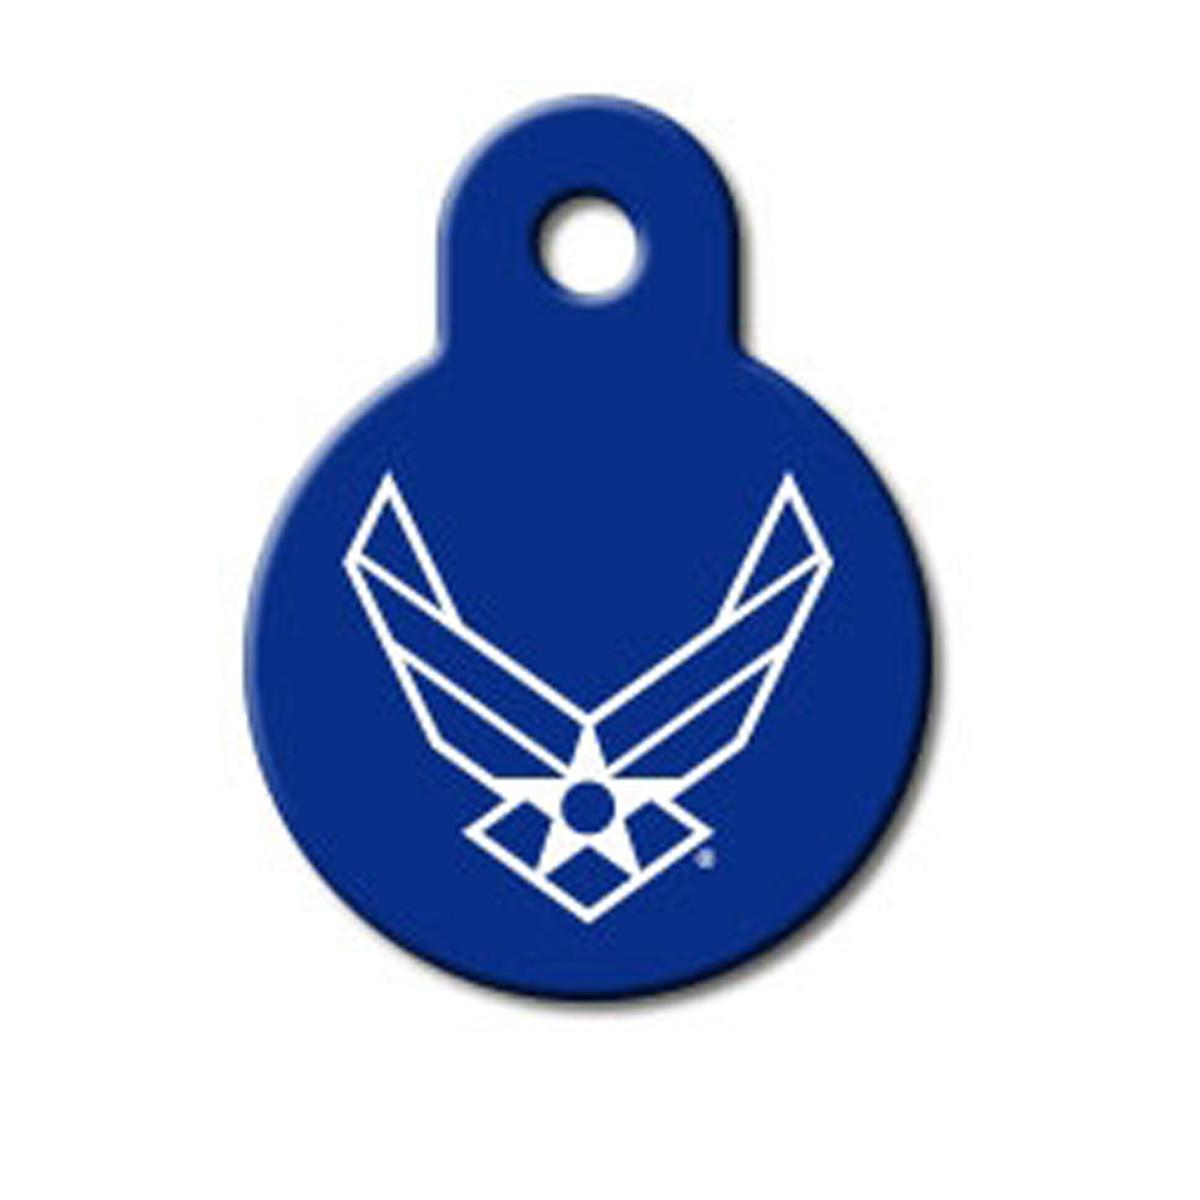 U.S. Air Force Engravable Pet I.D. Tag - Small Circle